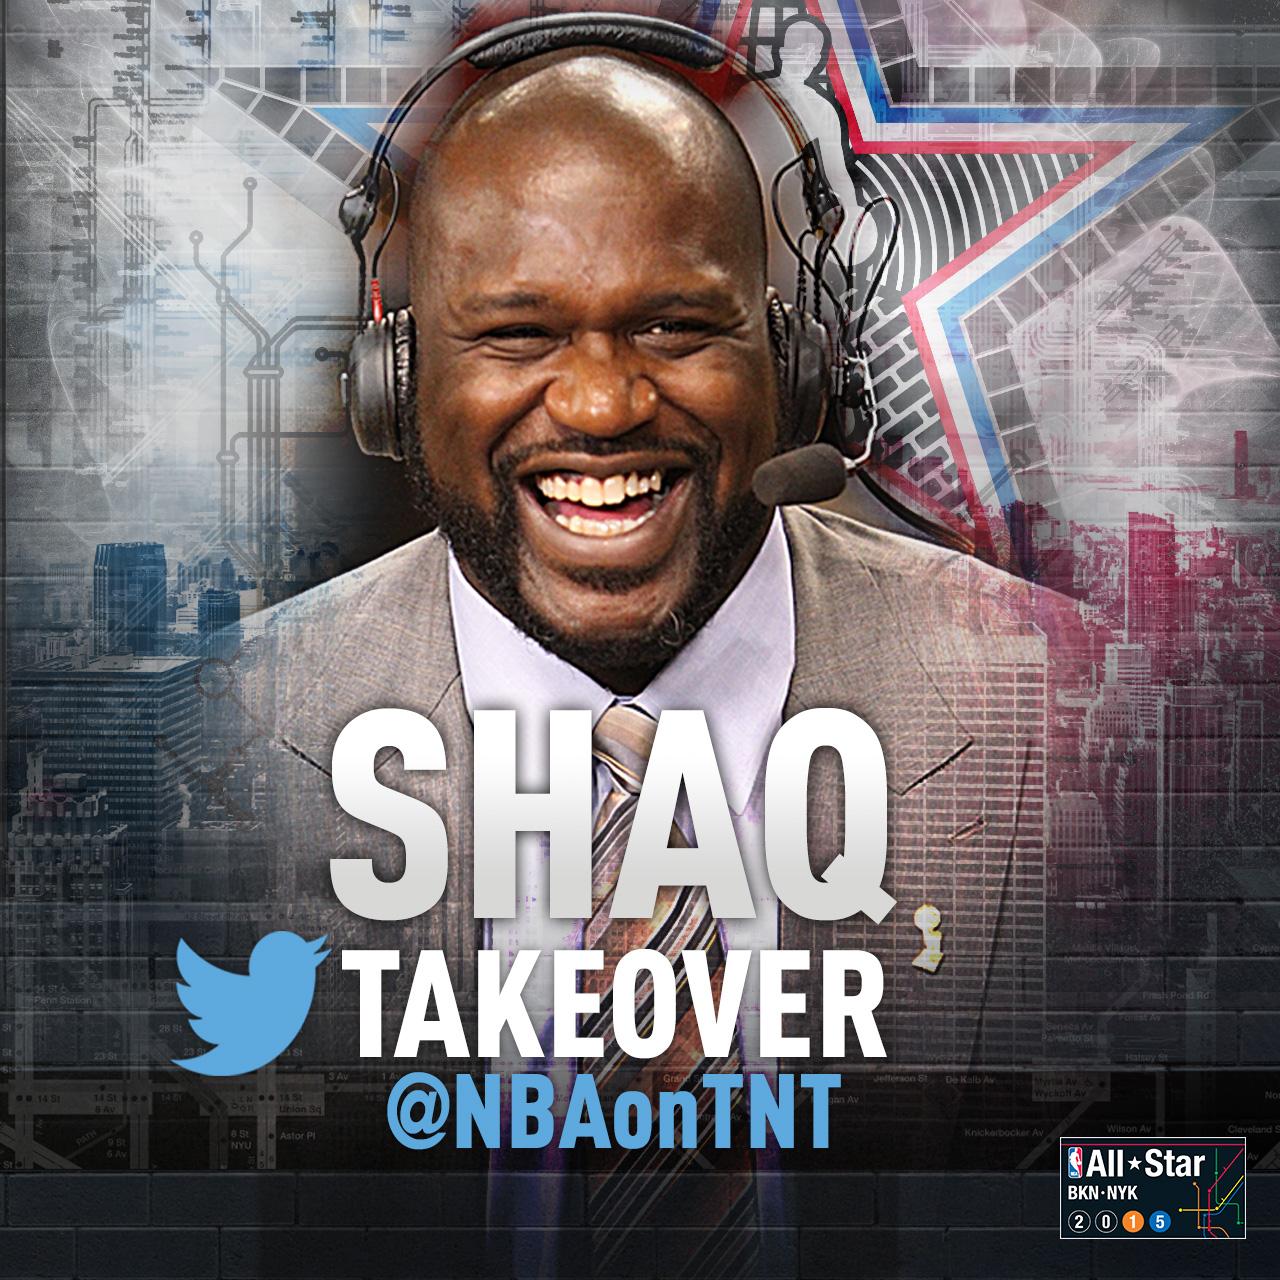 Shaq Takeover Promo